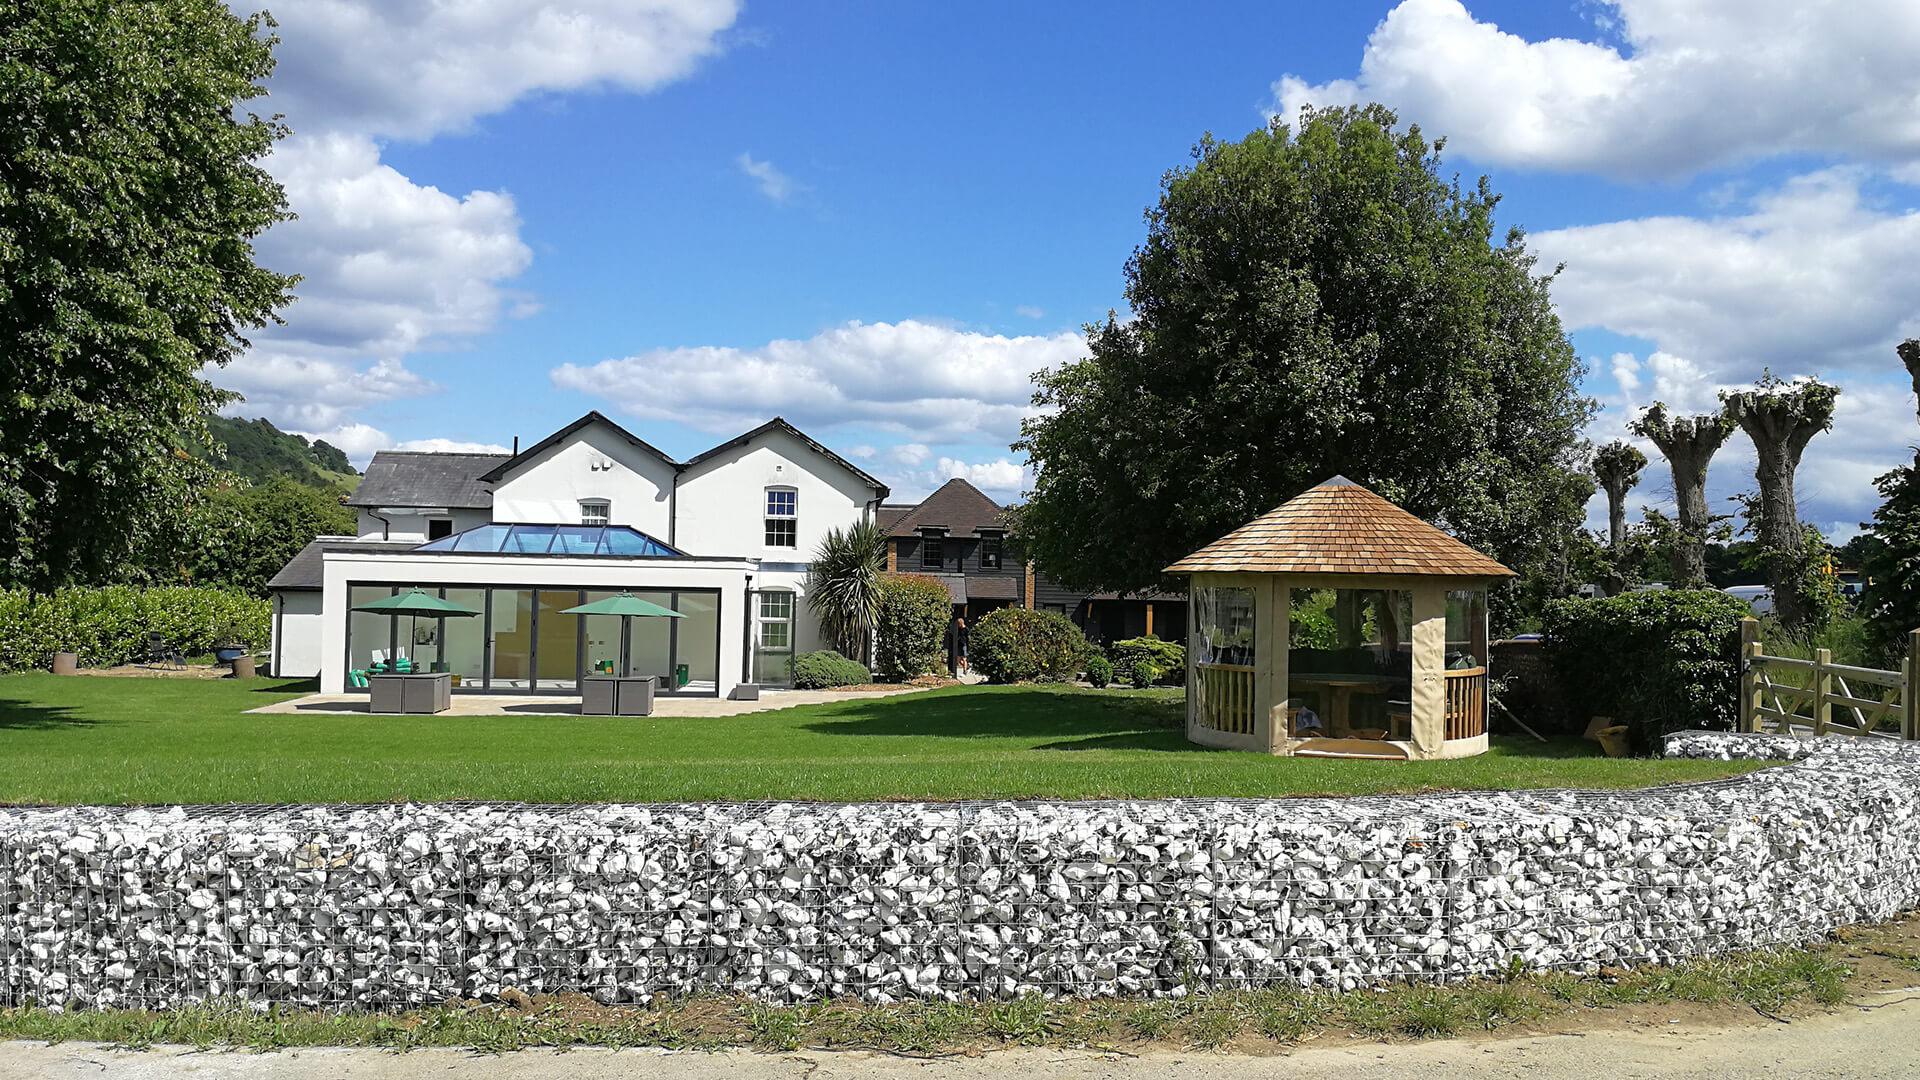 JC Buchanan - Building Refurbishment and Fit Out Commercial - Surrey Hampshire West Sussex